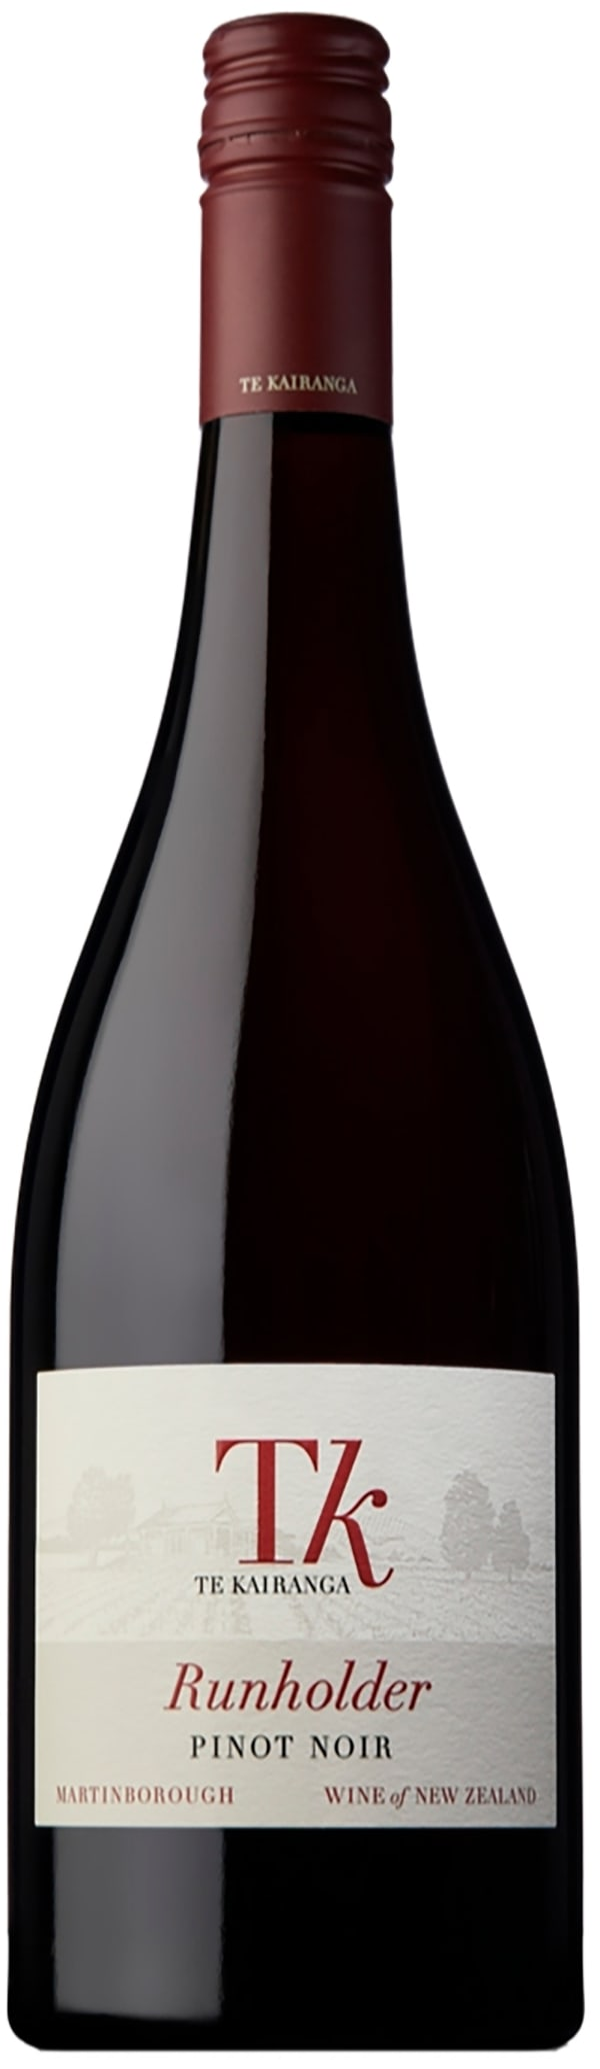 Te Kairanga Runholder Pinot Noir 2018